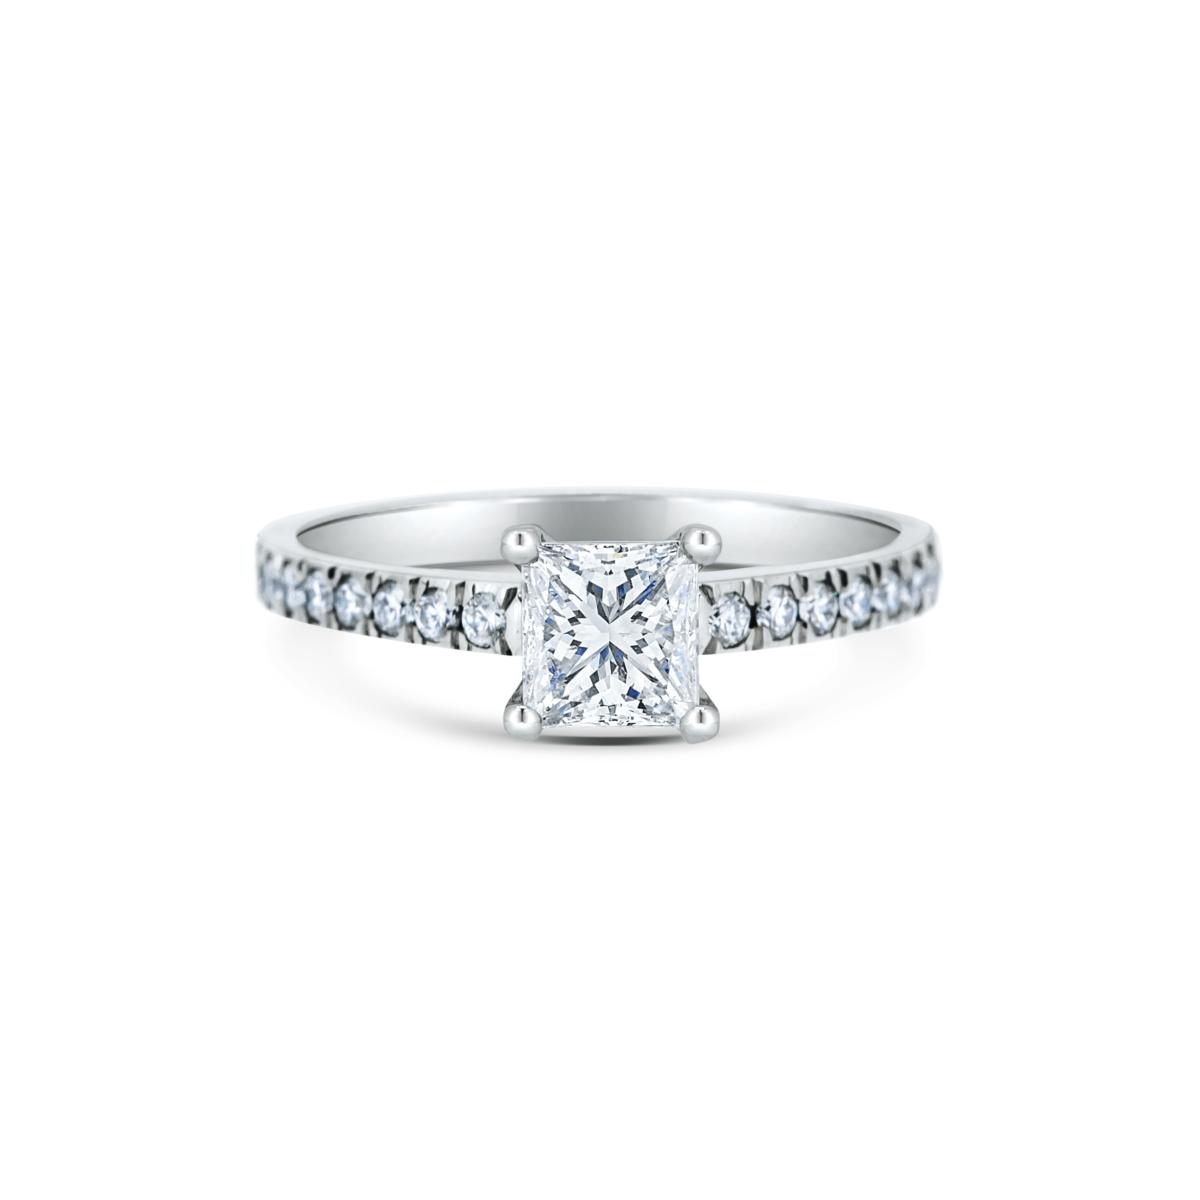 Adina Princess Microset Engagement Ring Front View